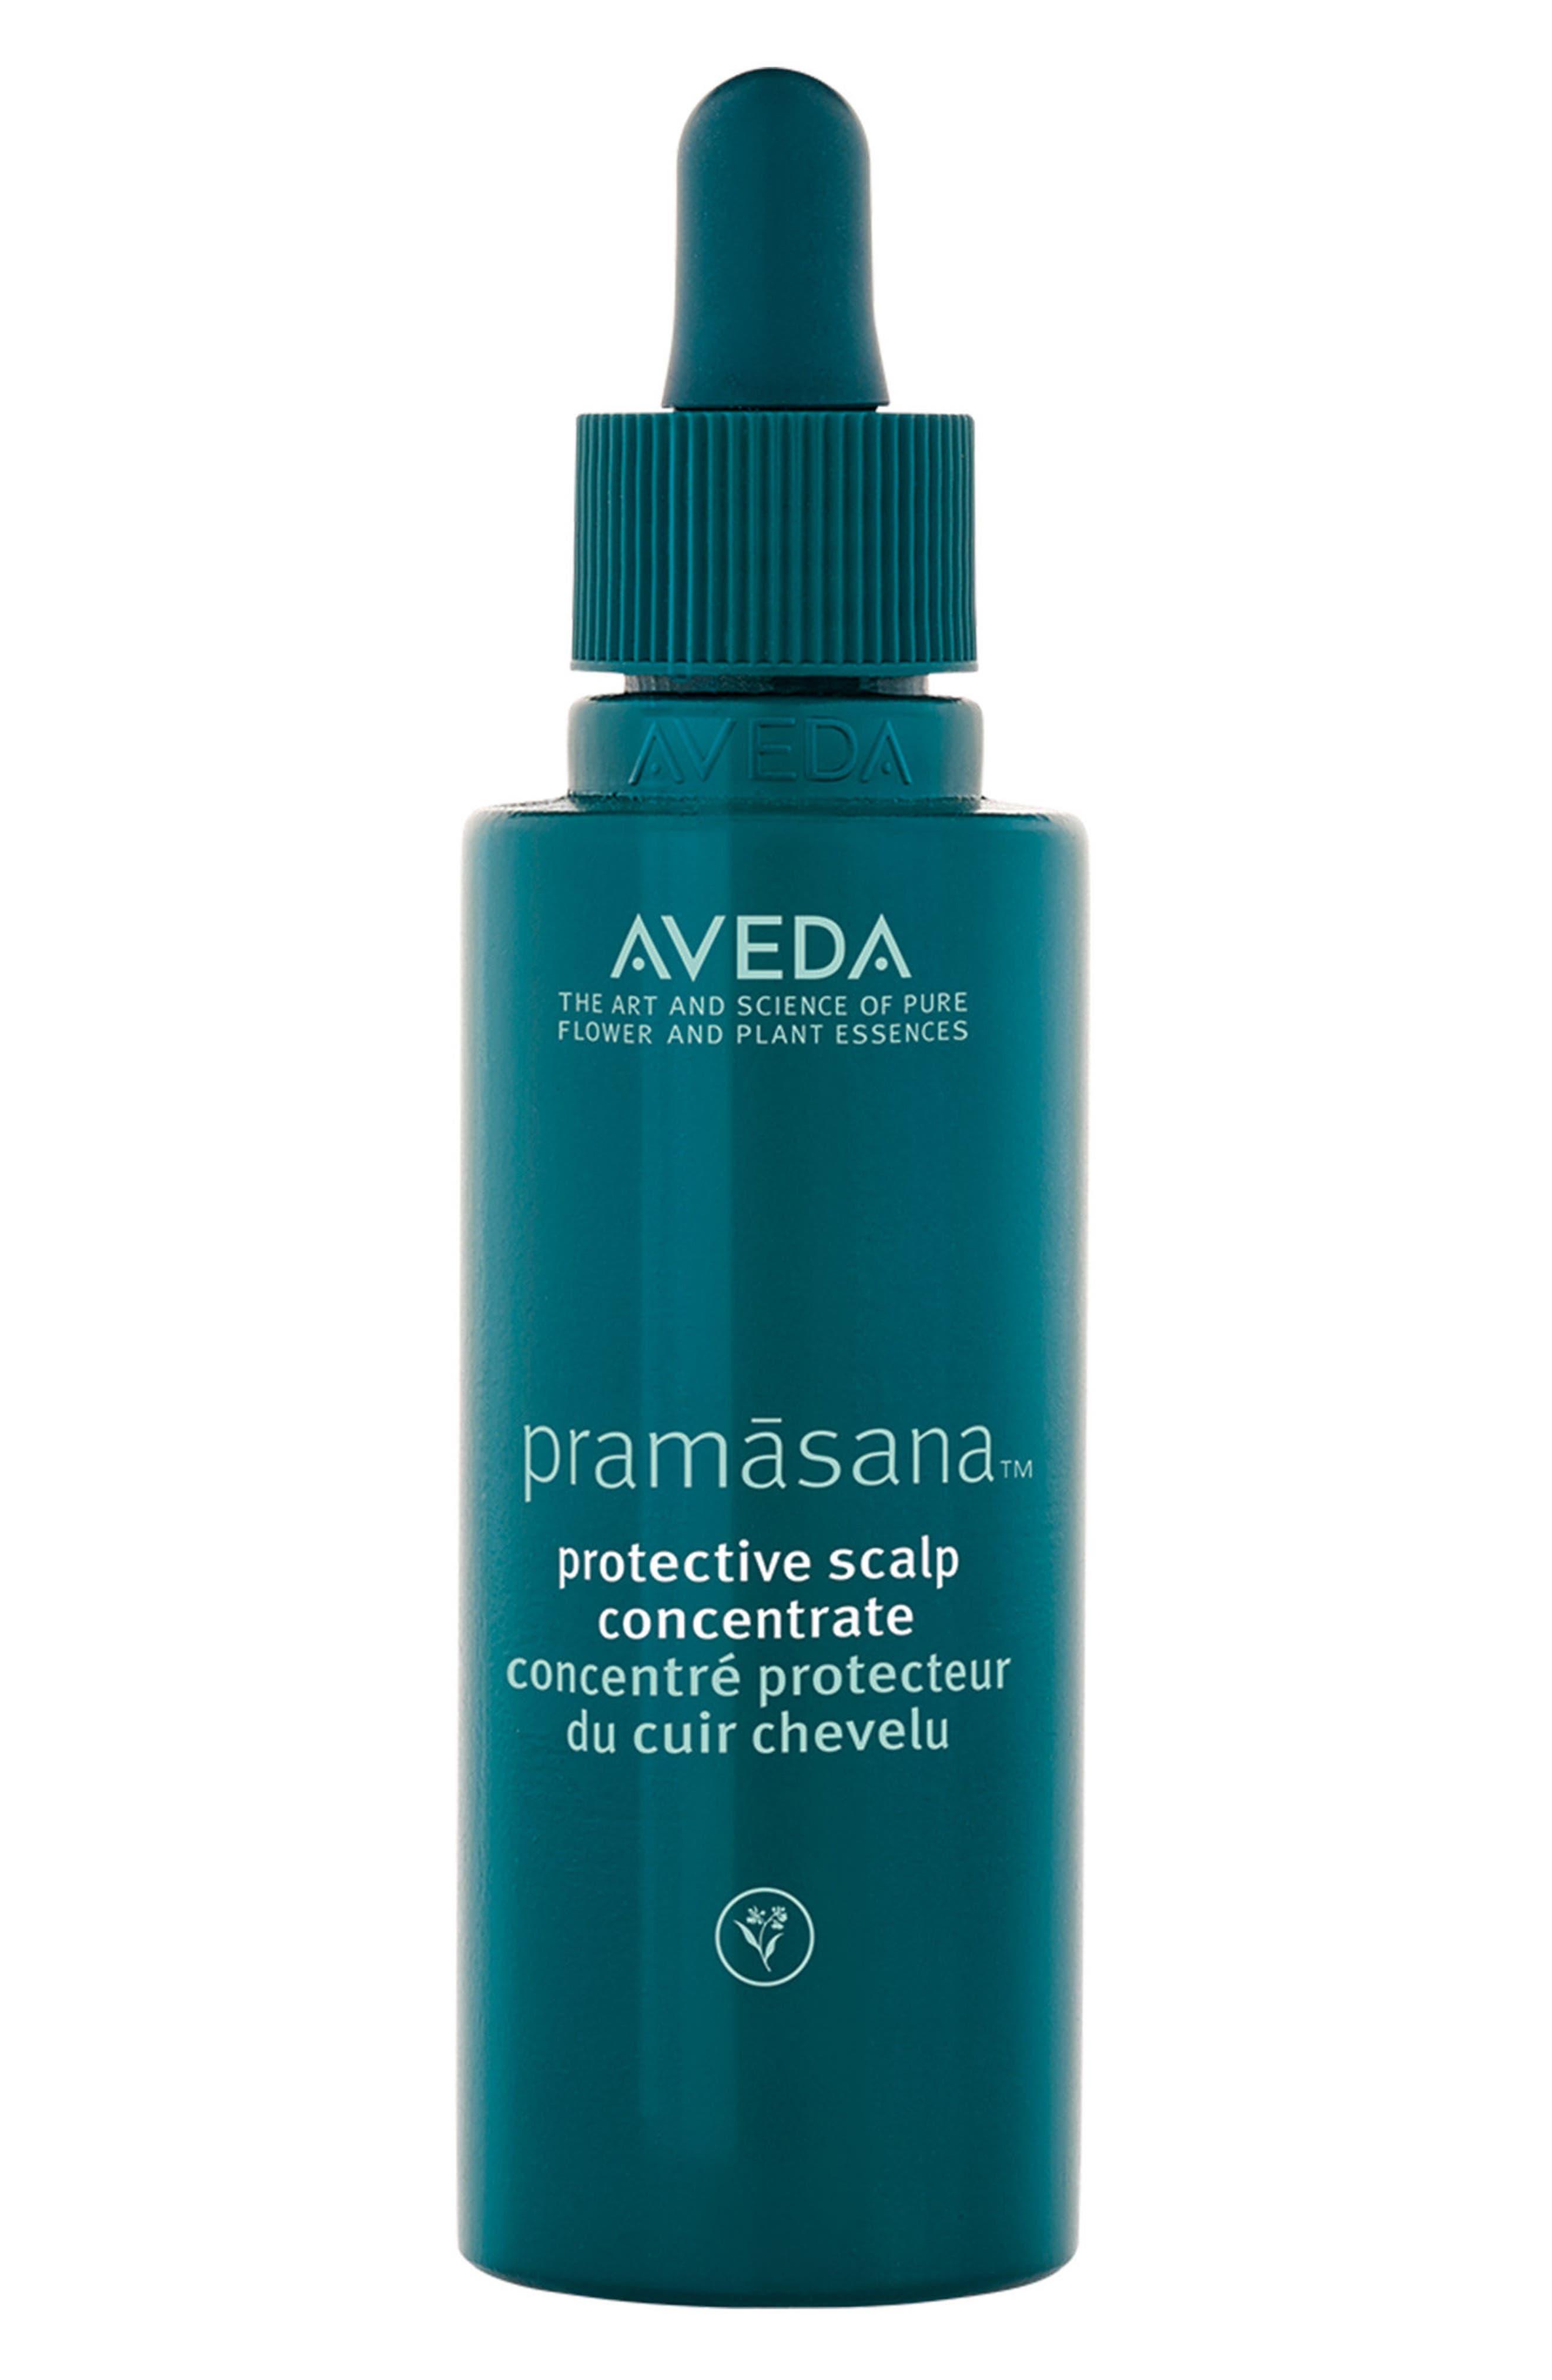 Aveda pramasana™ Protective Scalp Concentrate